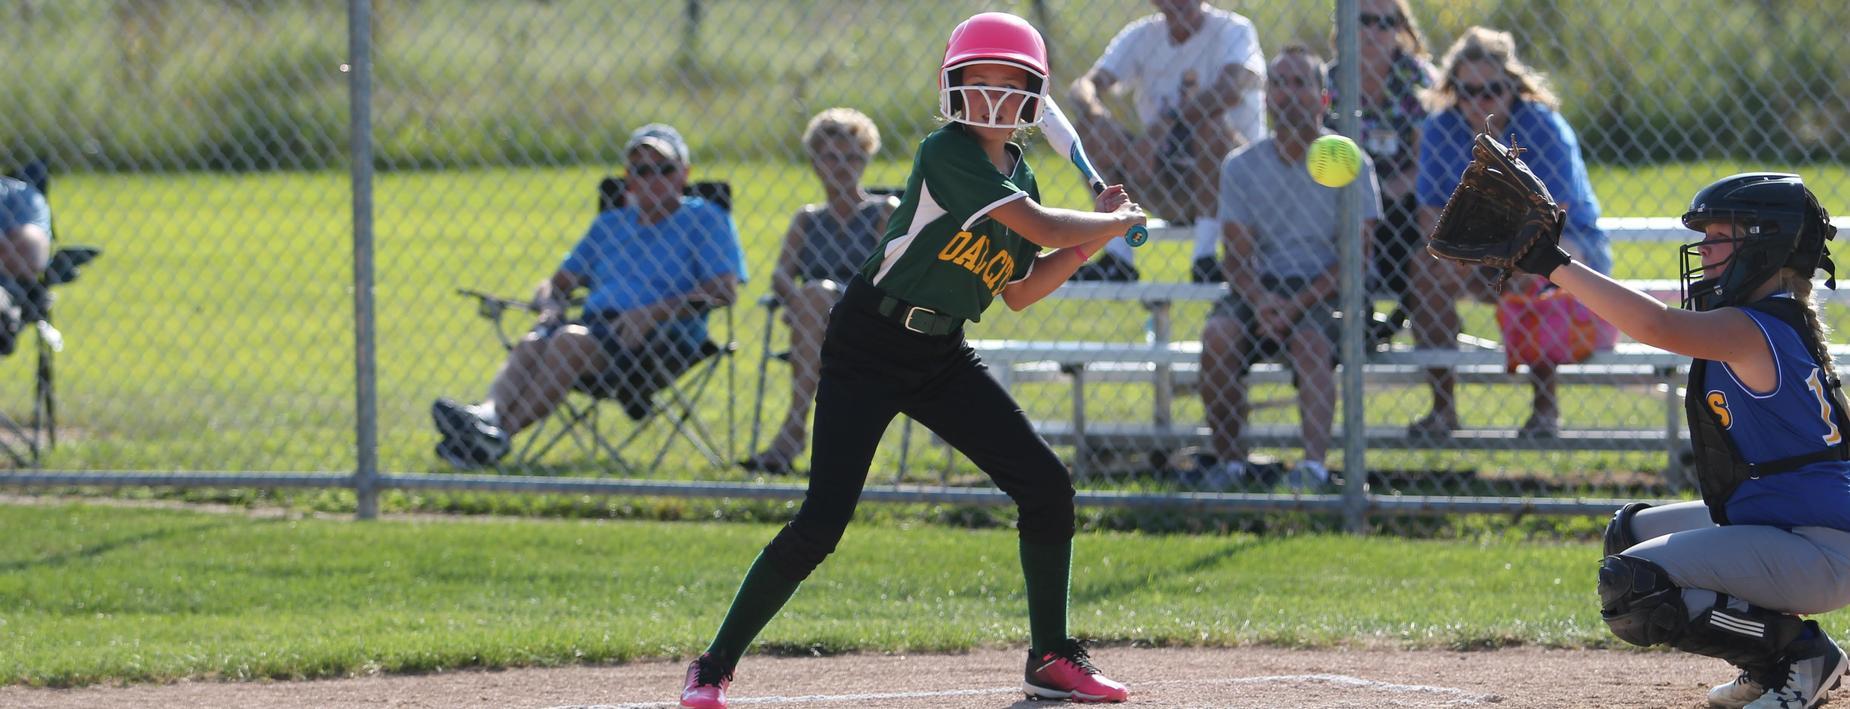 softball c